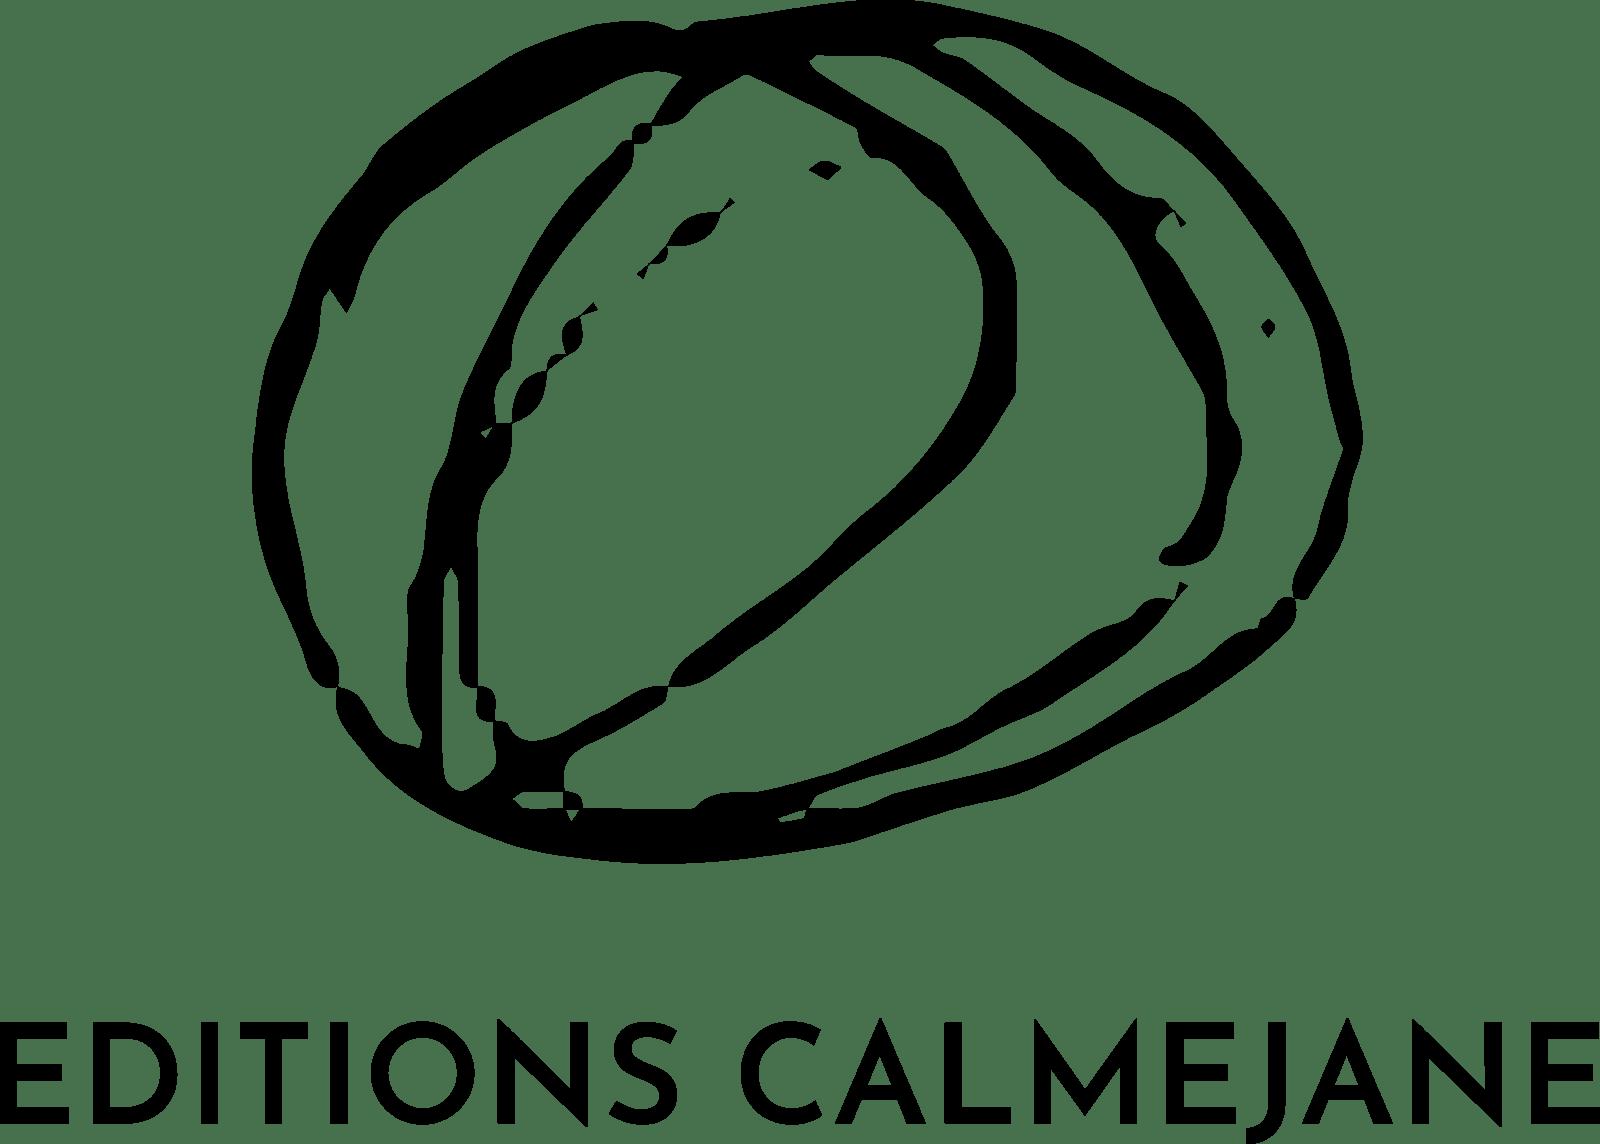 Editions Calmejane